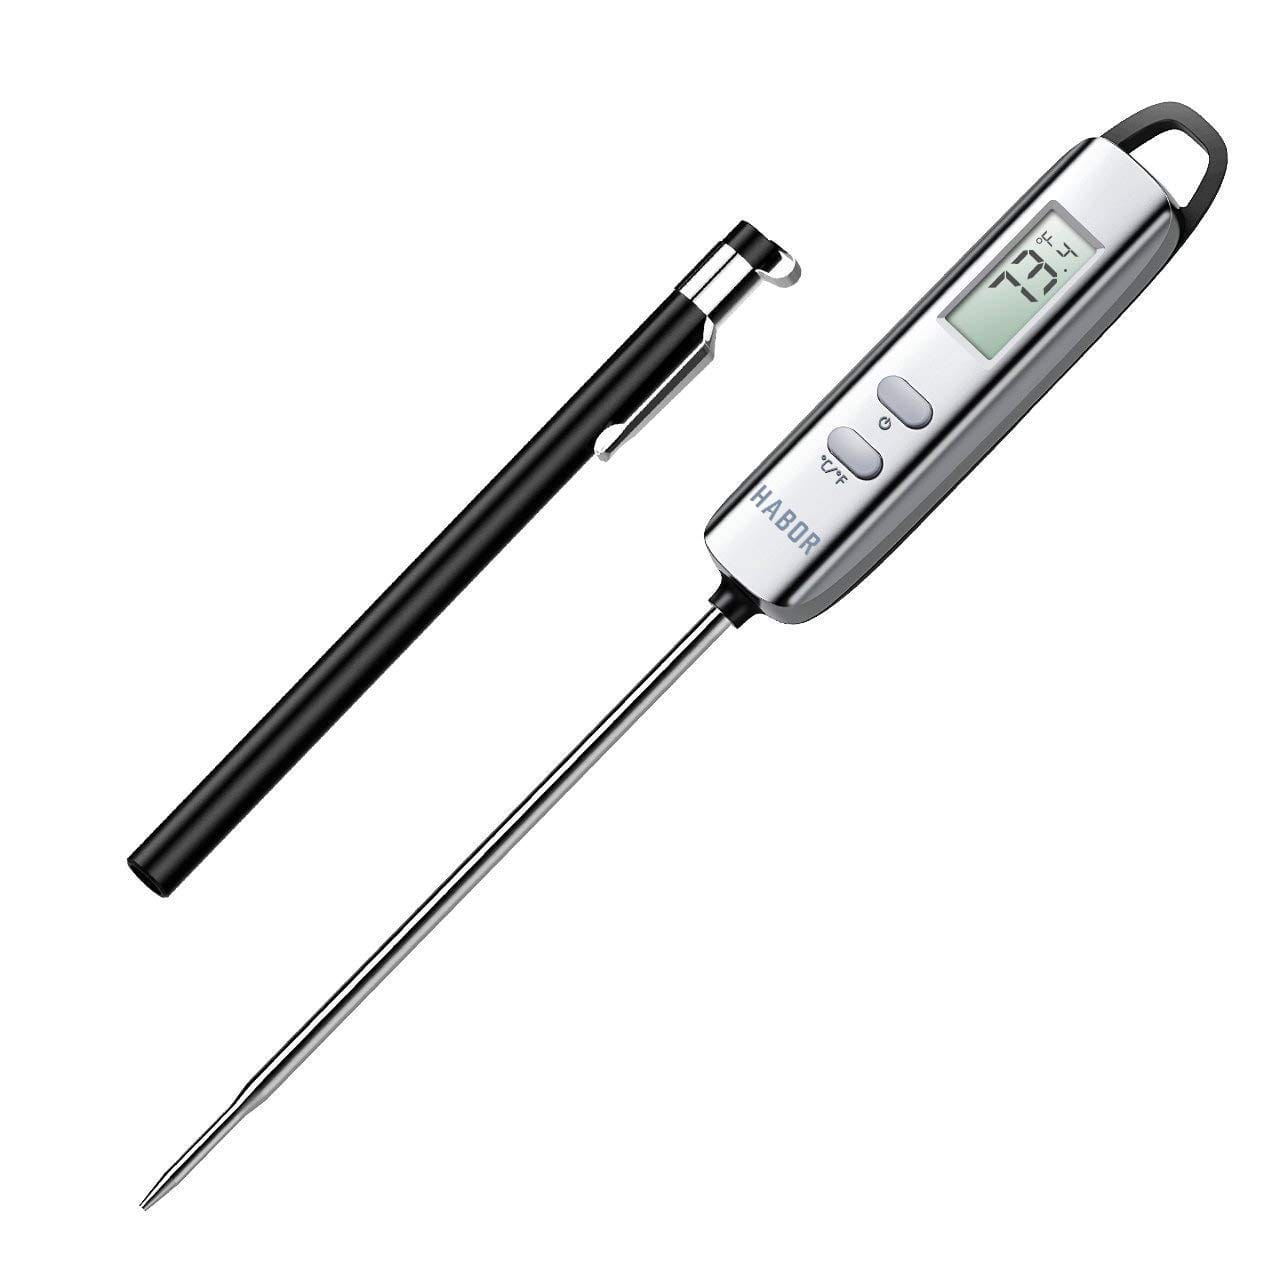 Thermomètre numérique multi-usage